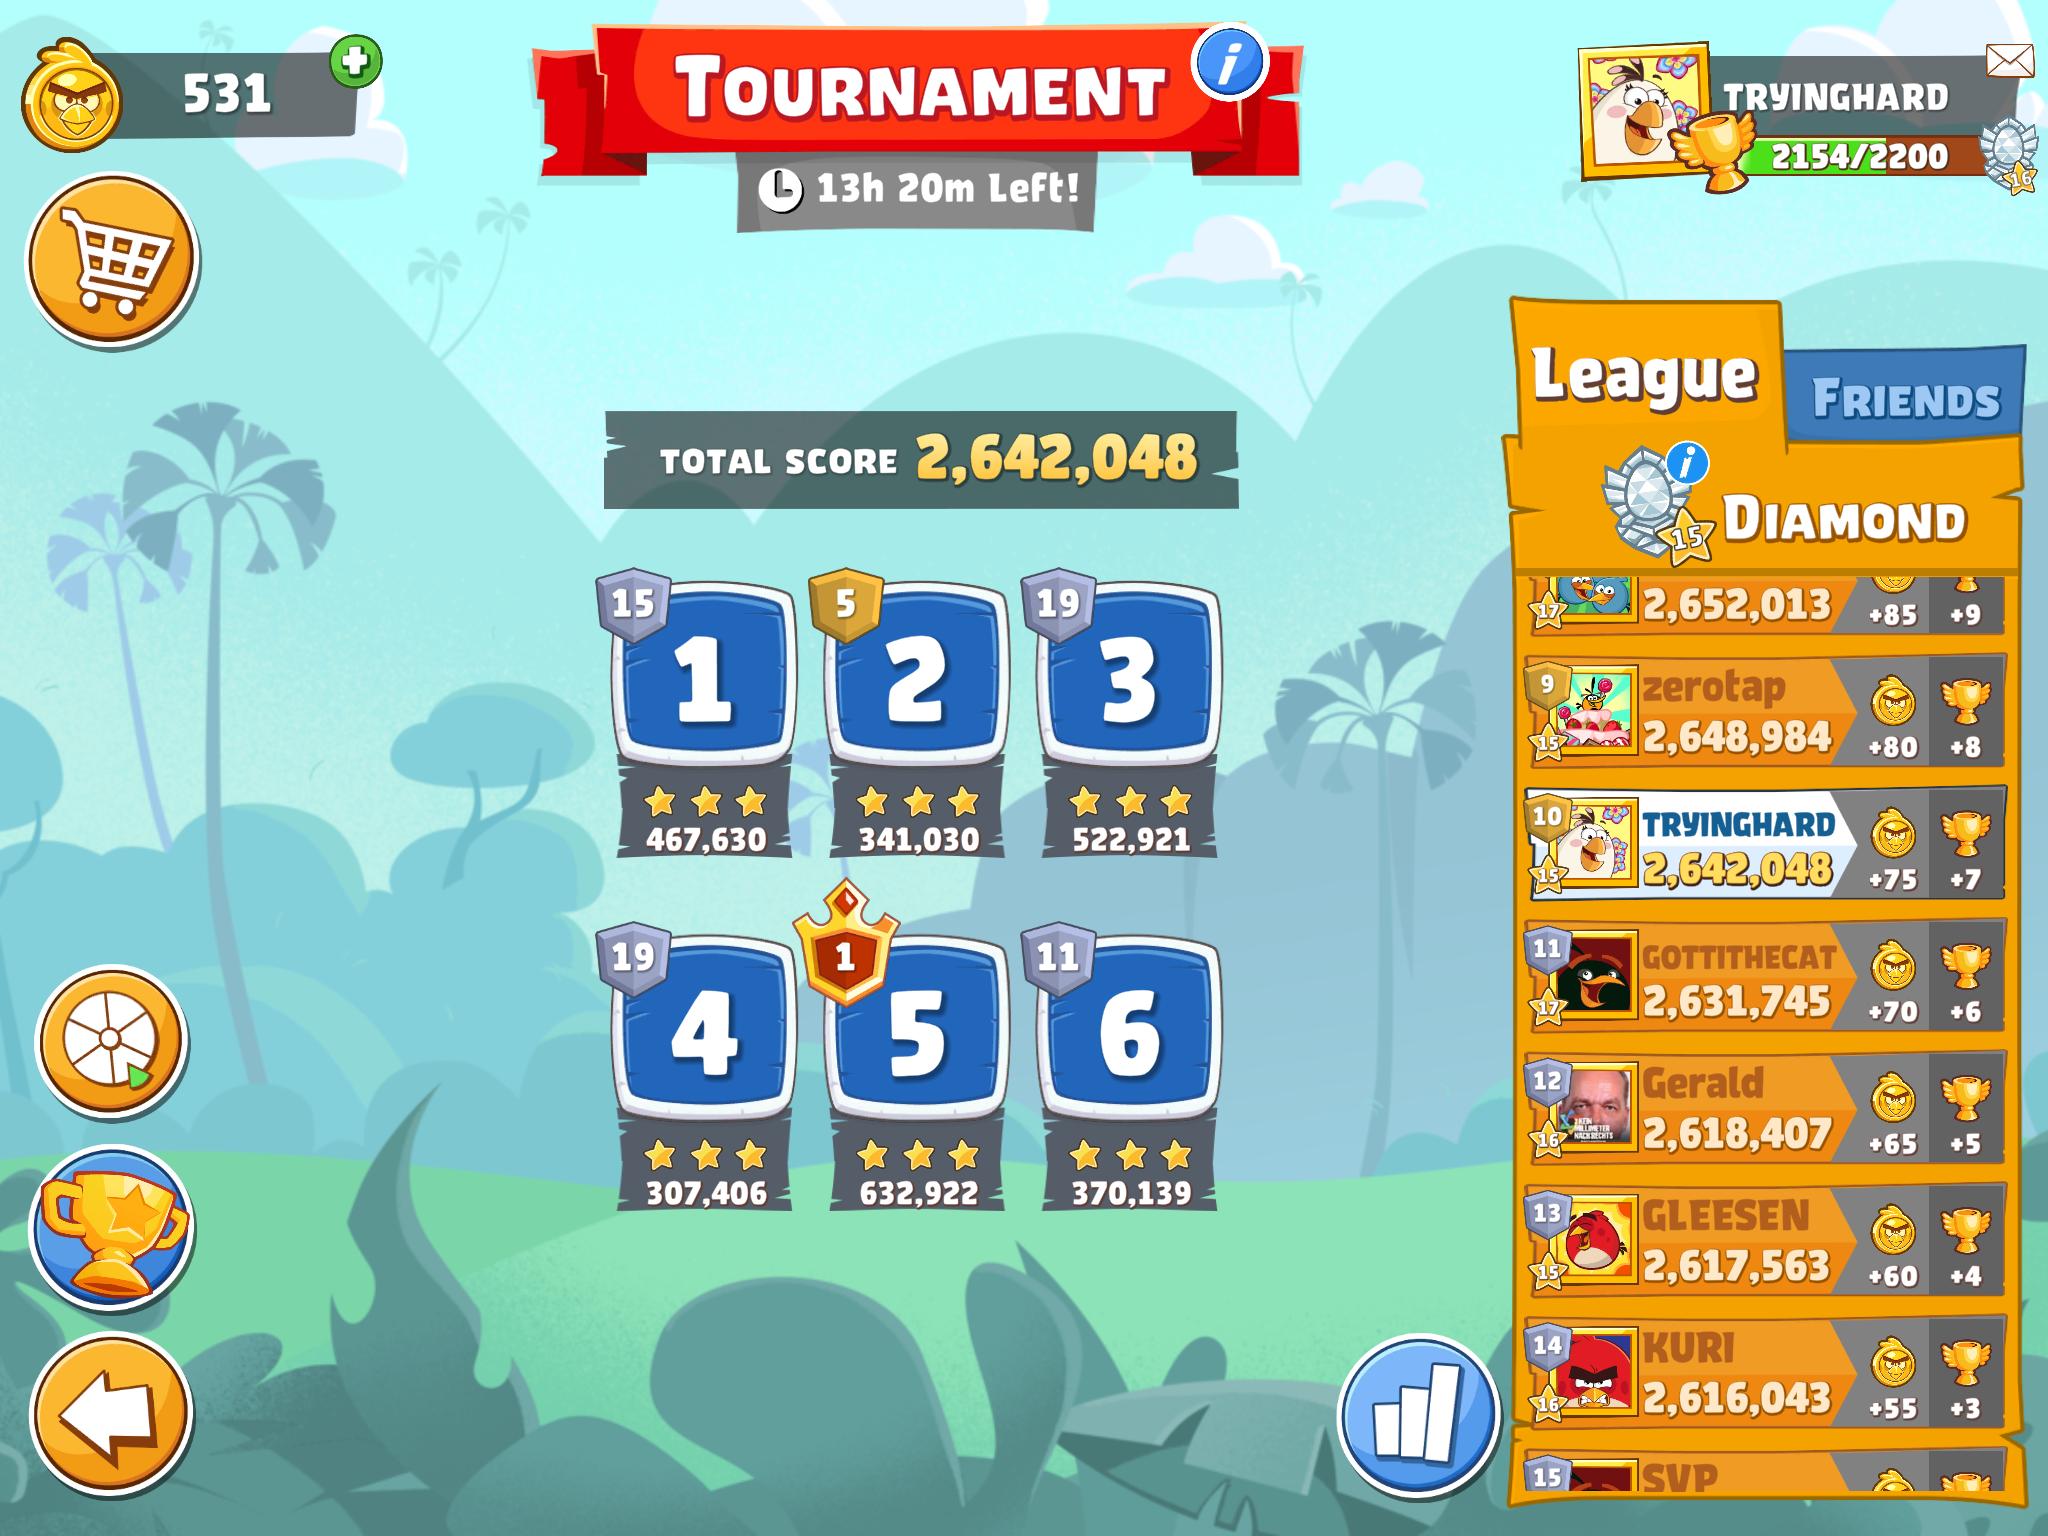 Total scores